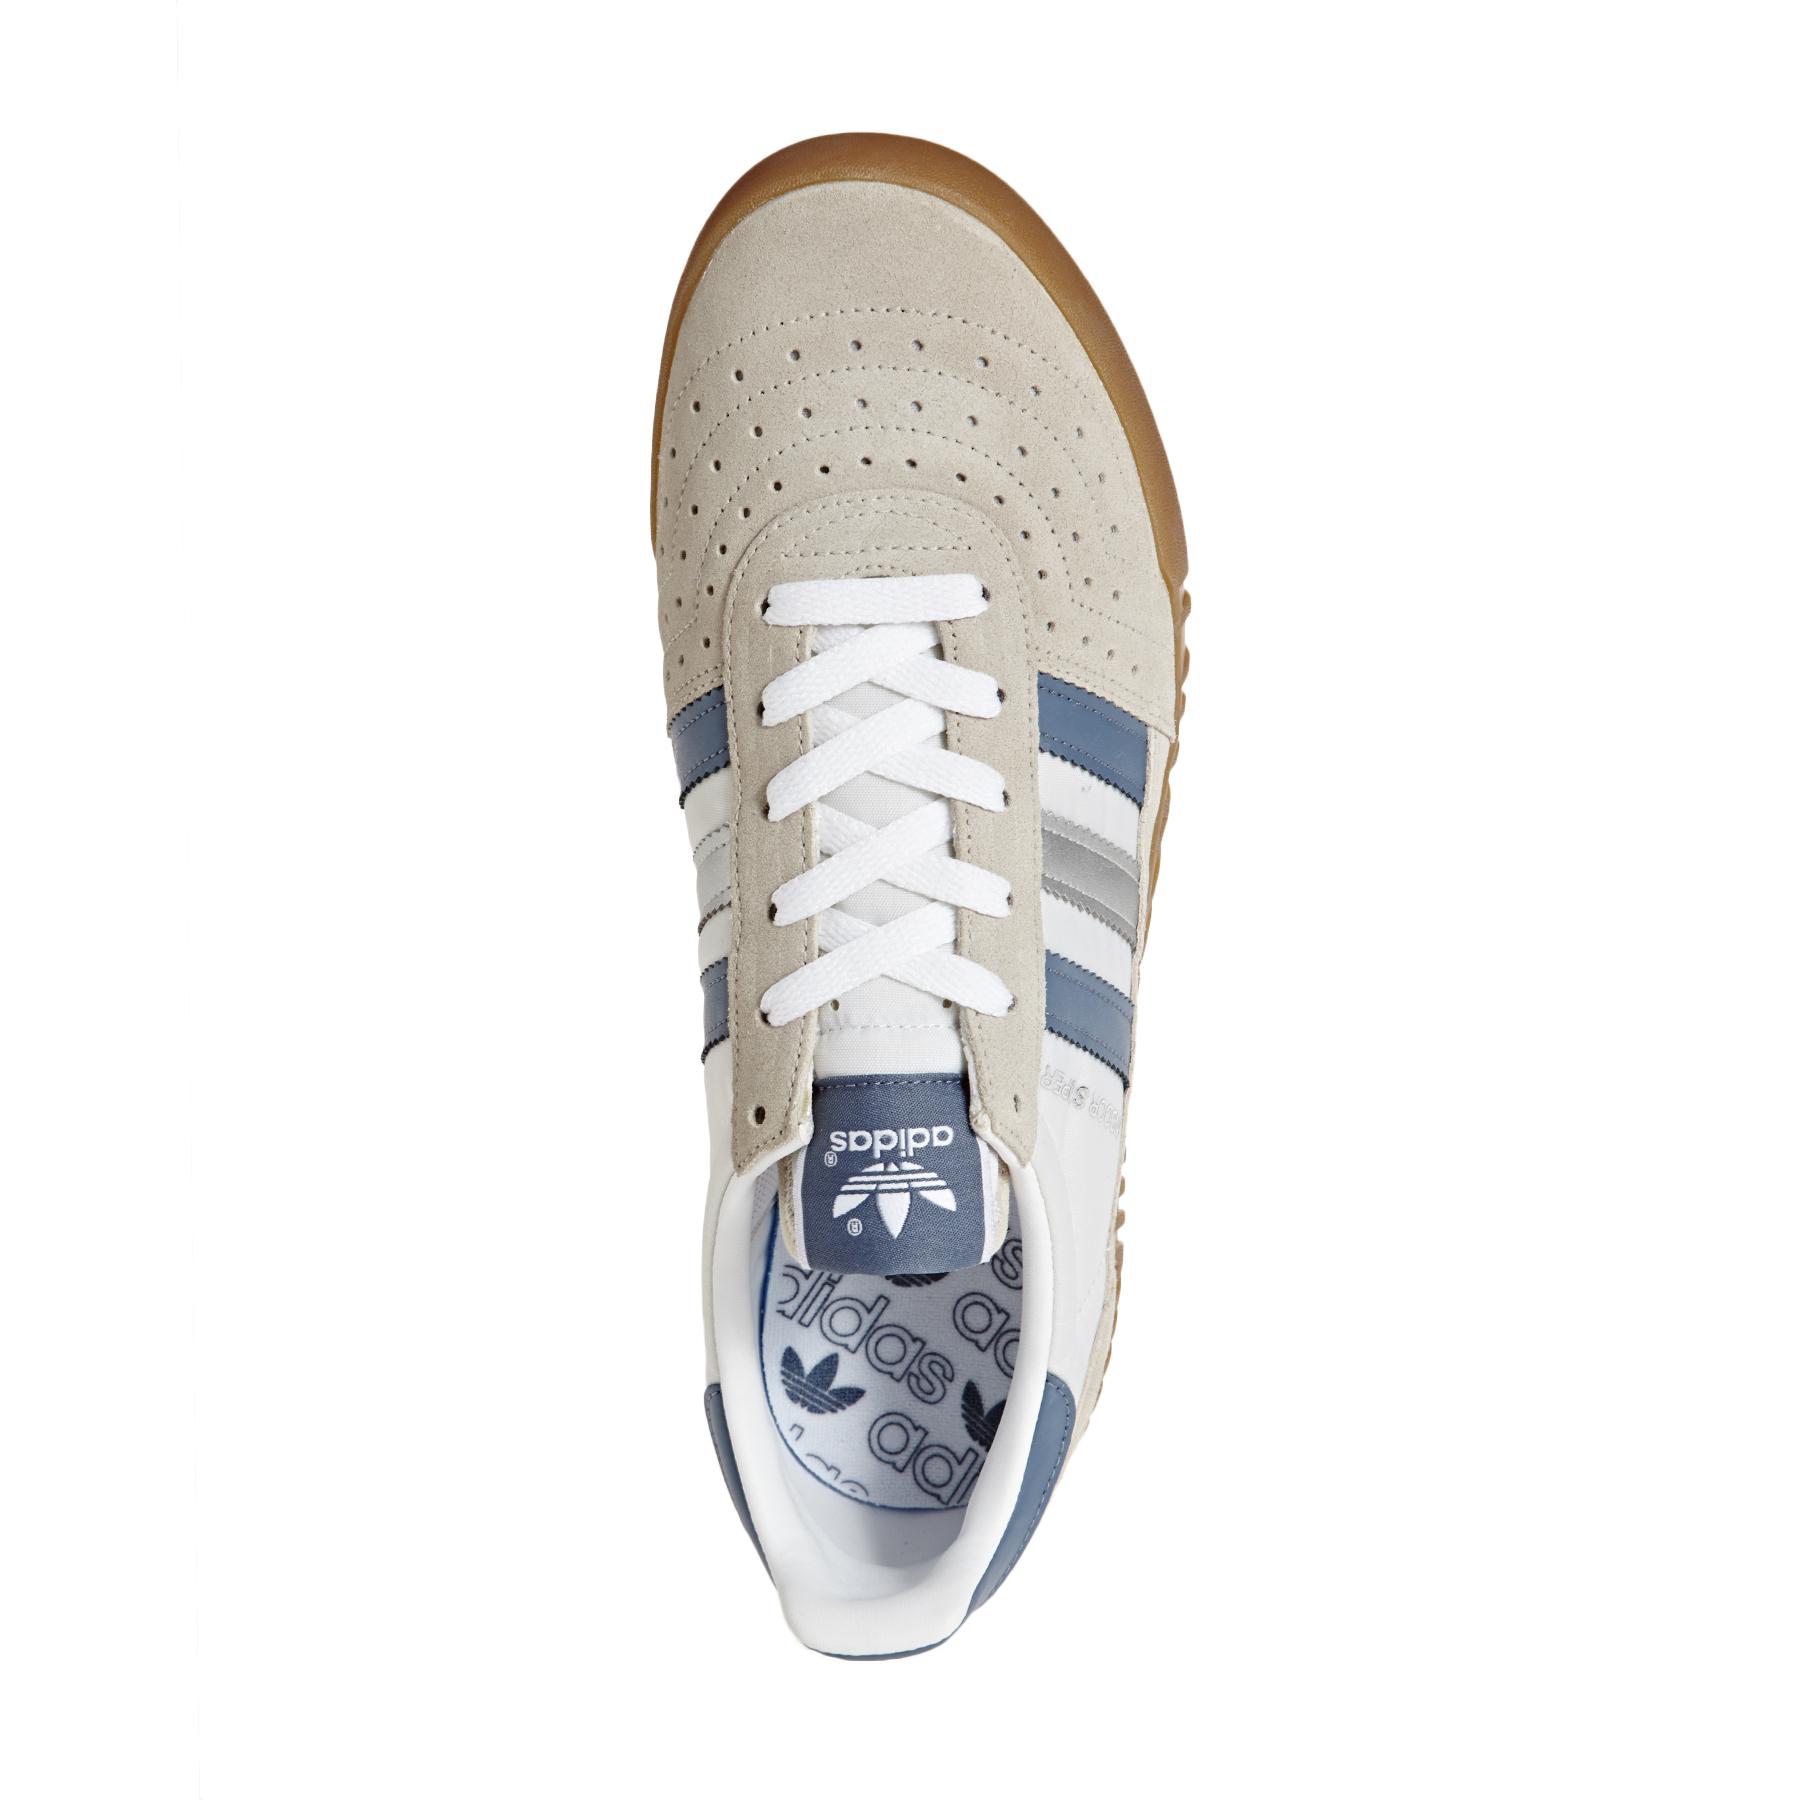 Adidas Originals Indoor Super Shoes | Free Delivery Options